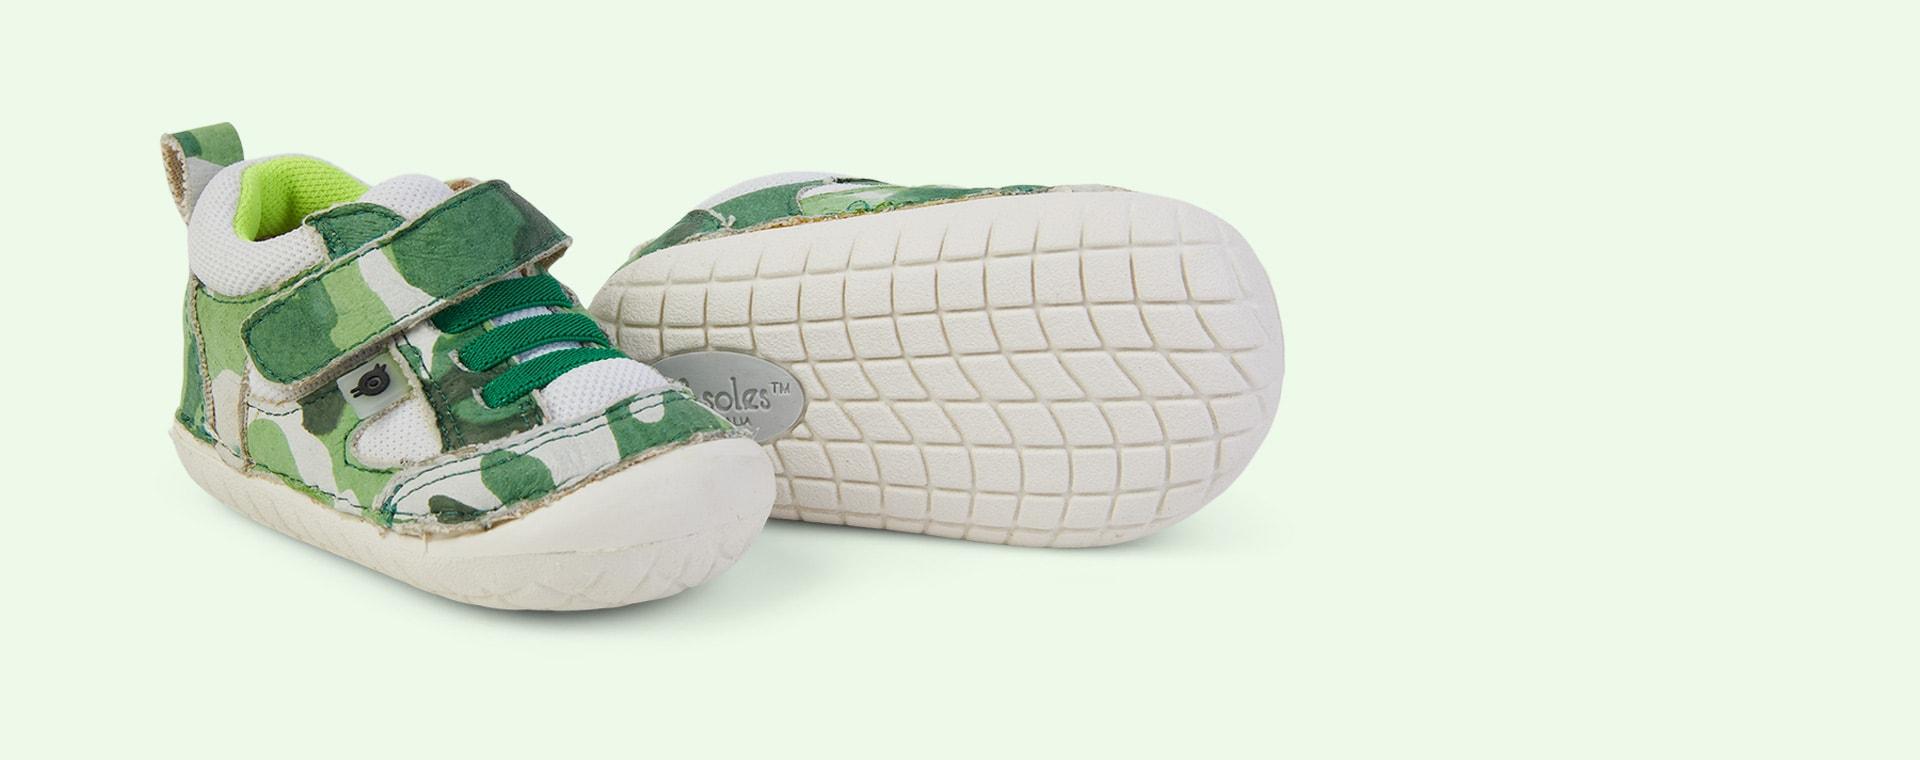 Field Camo/White/ Neon Green old soles Bru Pave